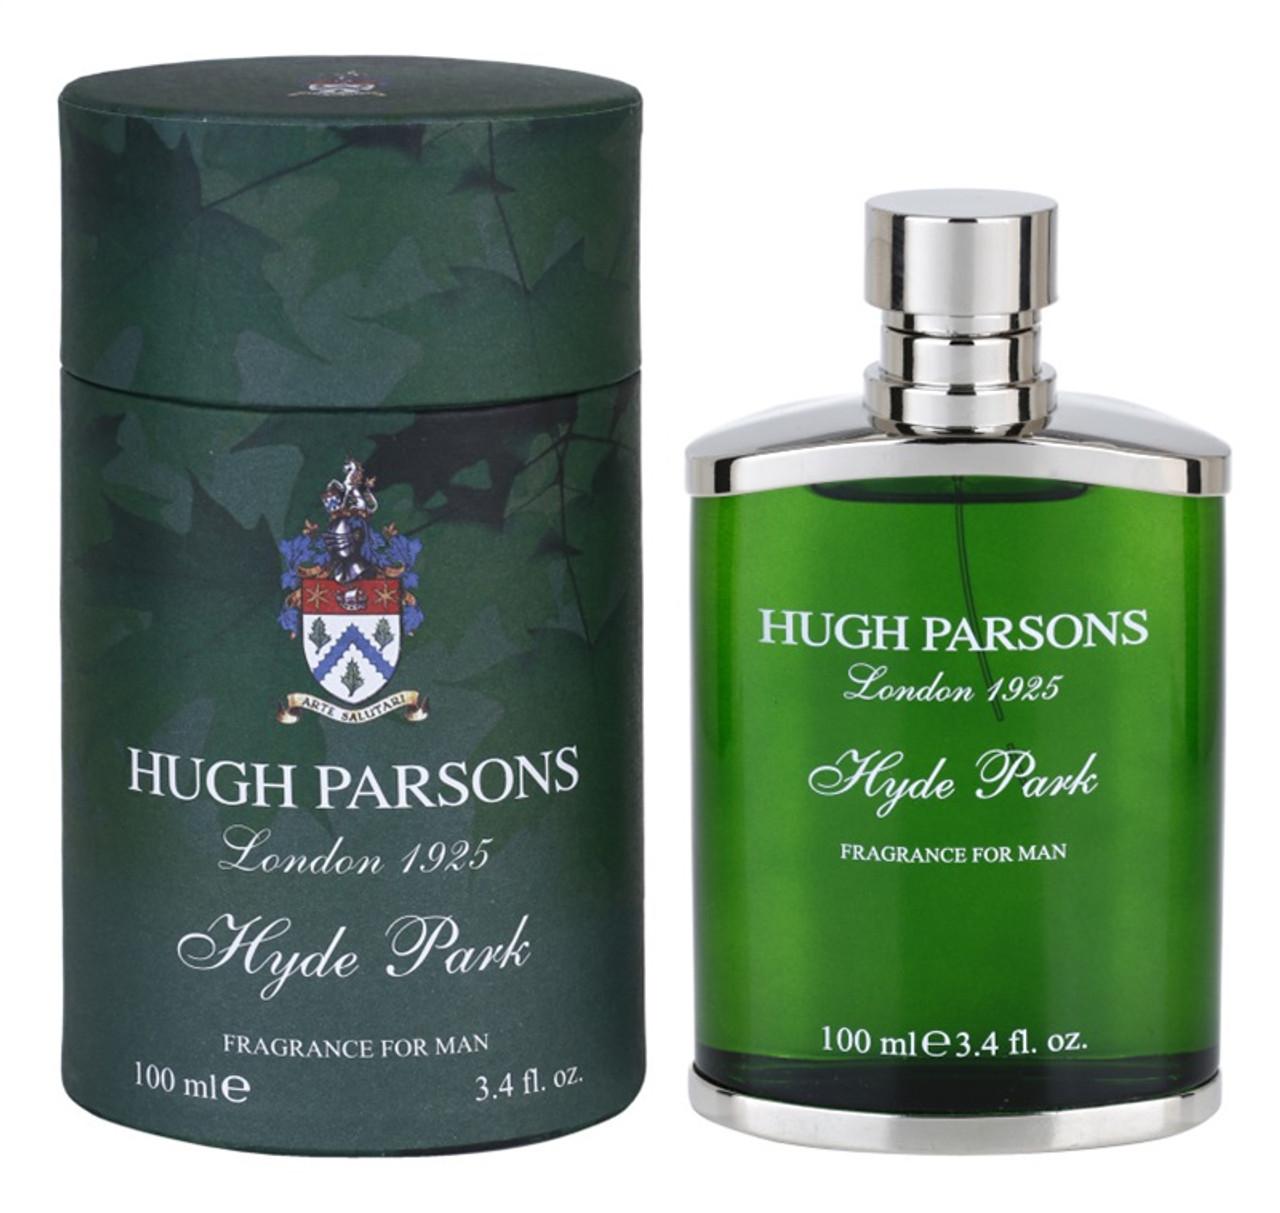 Hugh Parsons Hyde Park Eau De Parfum Chicago Haircut Grooming